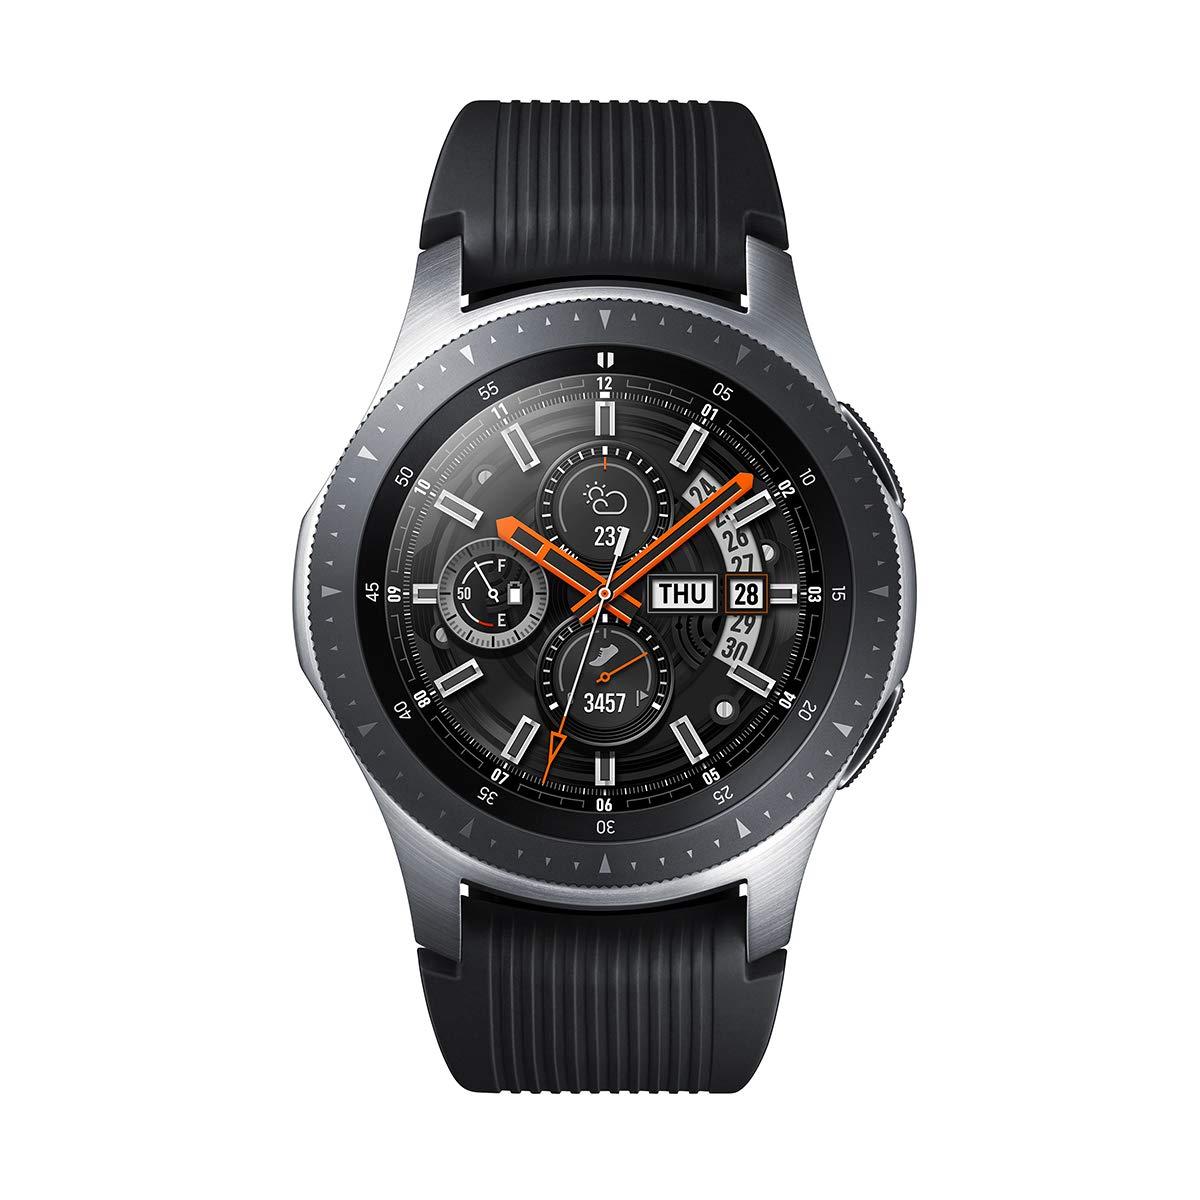 Samsung Galaxy Watch Reloj Inteligente, LTE: Amazon.es